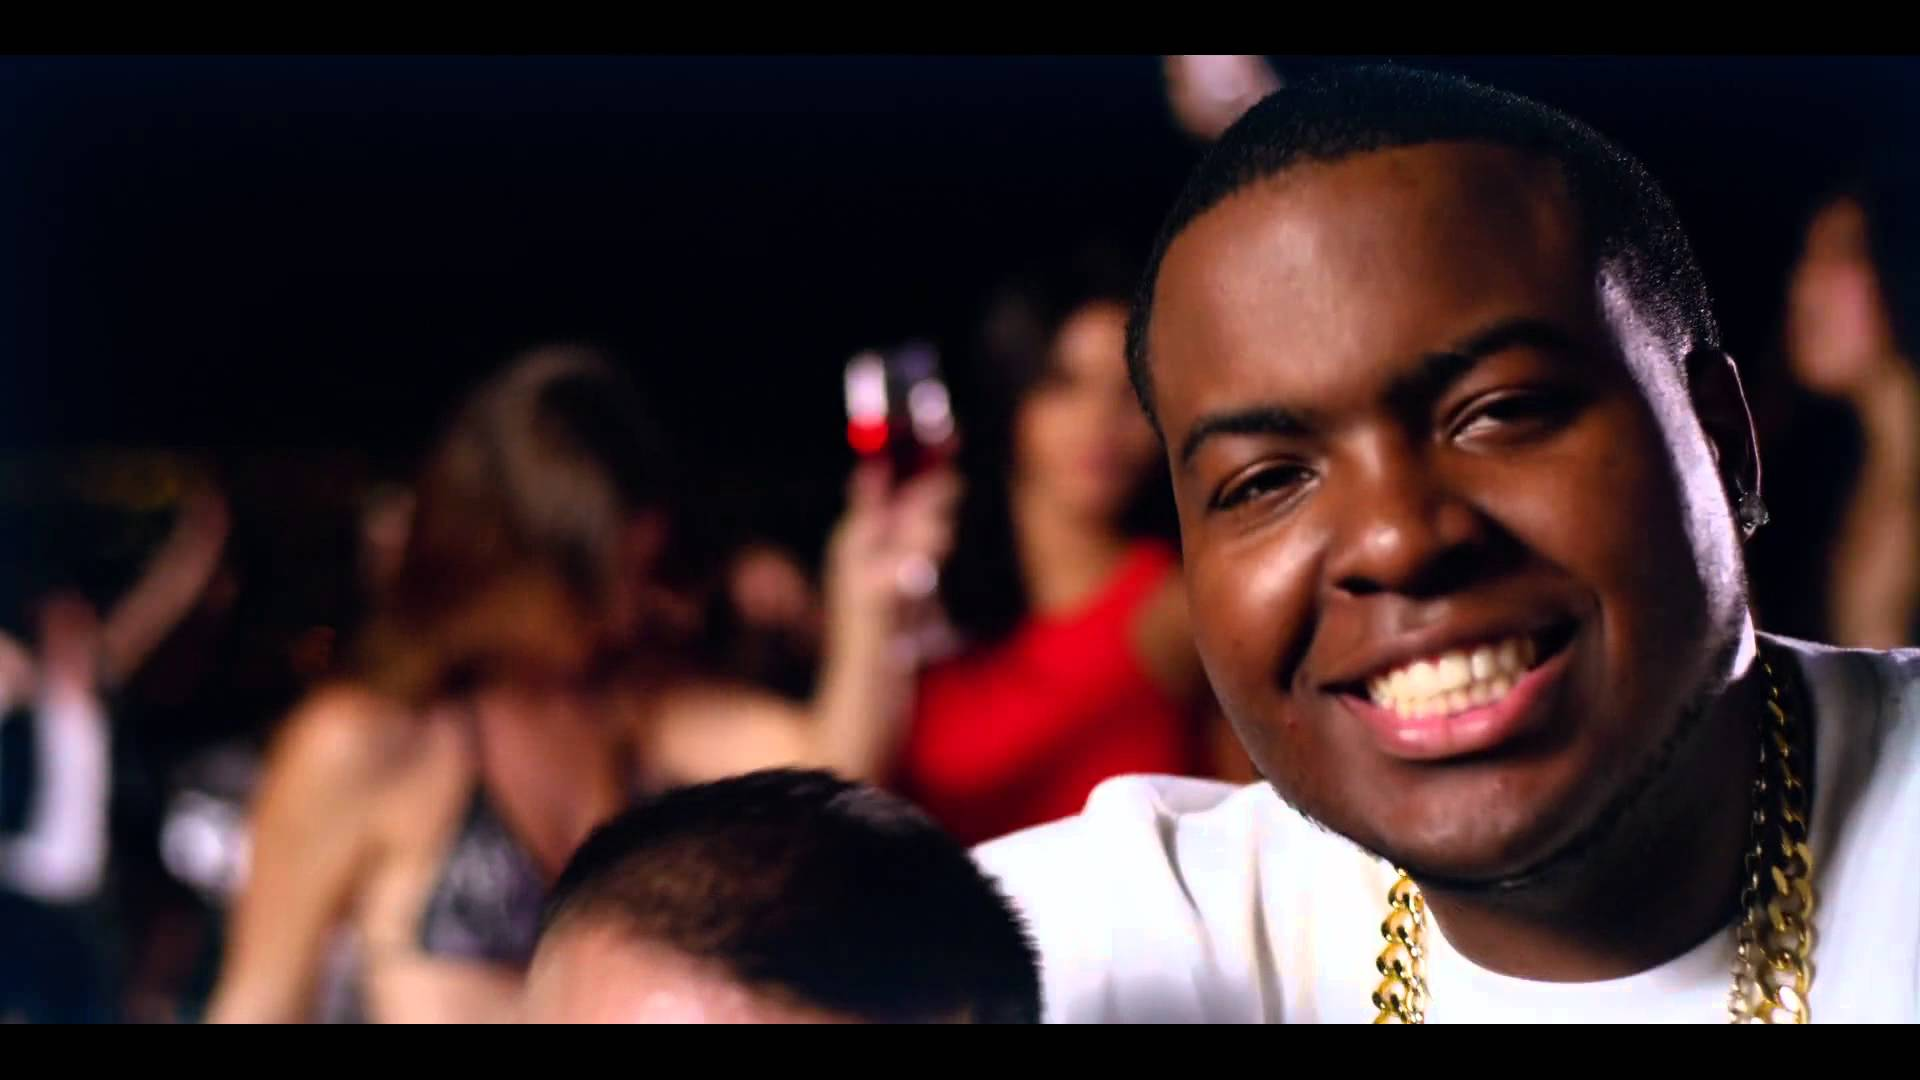 Prince Malik Feat. Sean Kingston – I'm Here to Drink